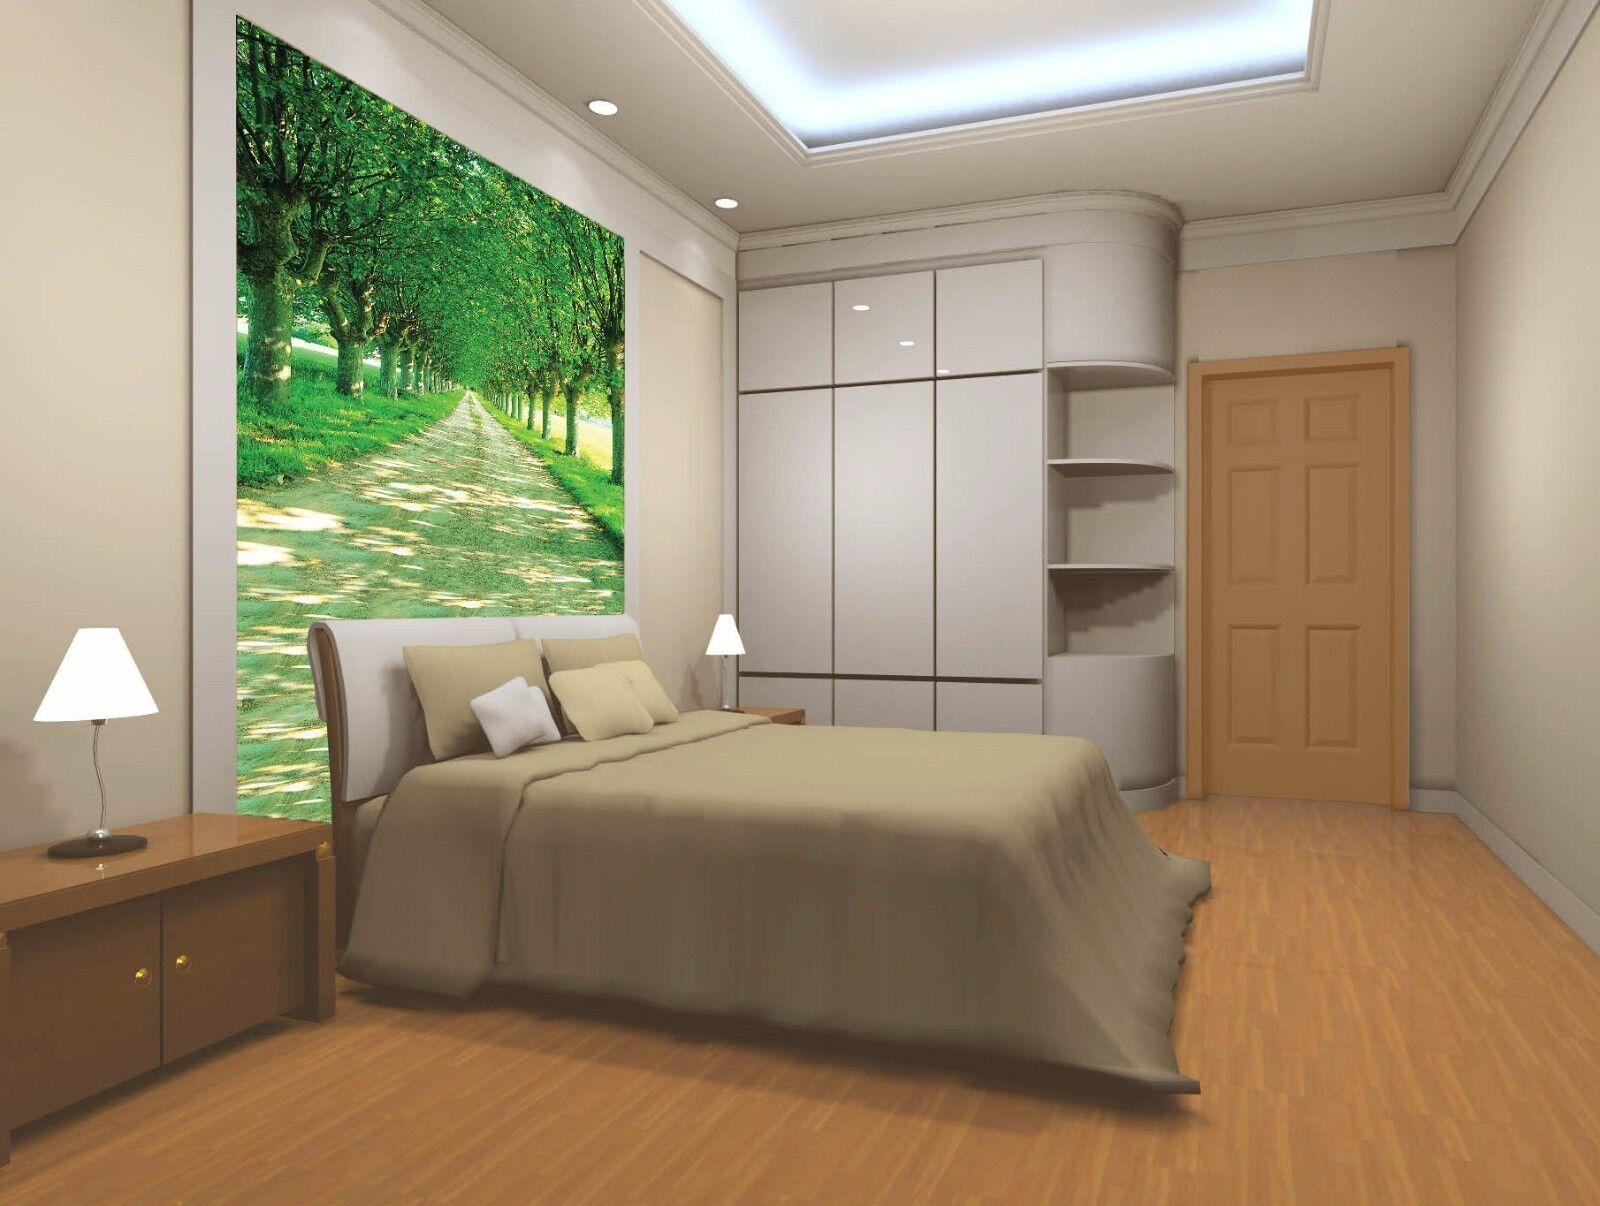 3D 3D 3D Road Trees Shade 003 Wall Paper Wall Print Decal Wall Deco Wall Indoor Murals 989569